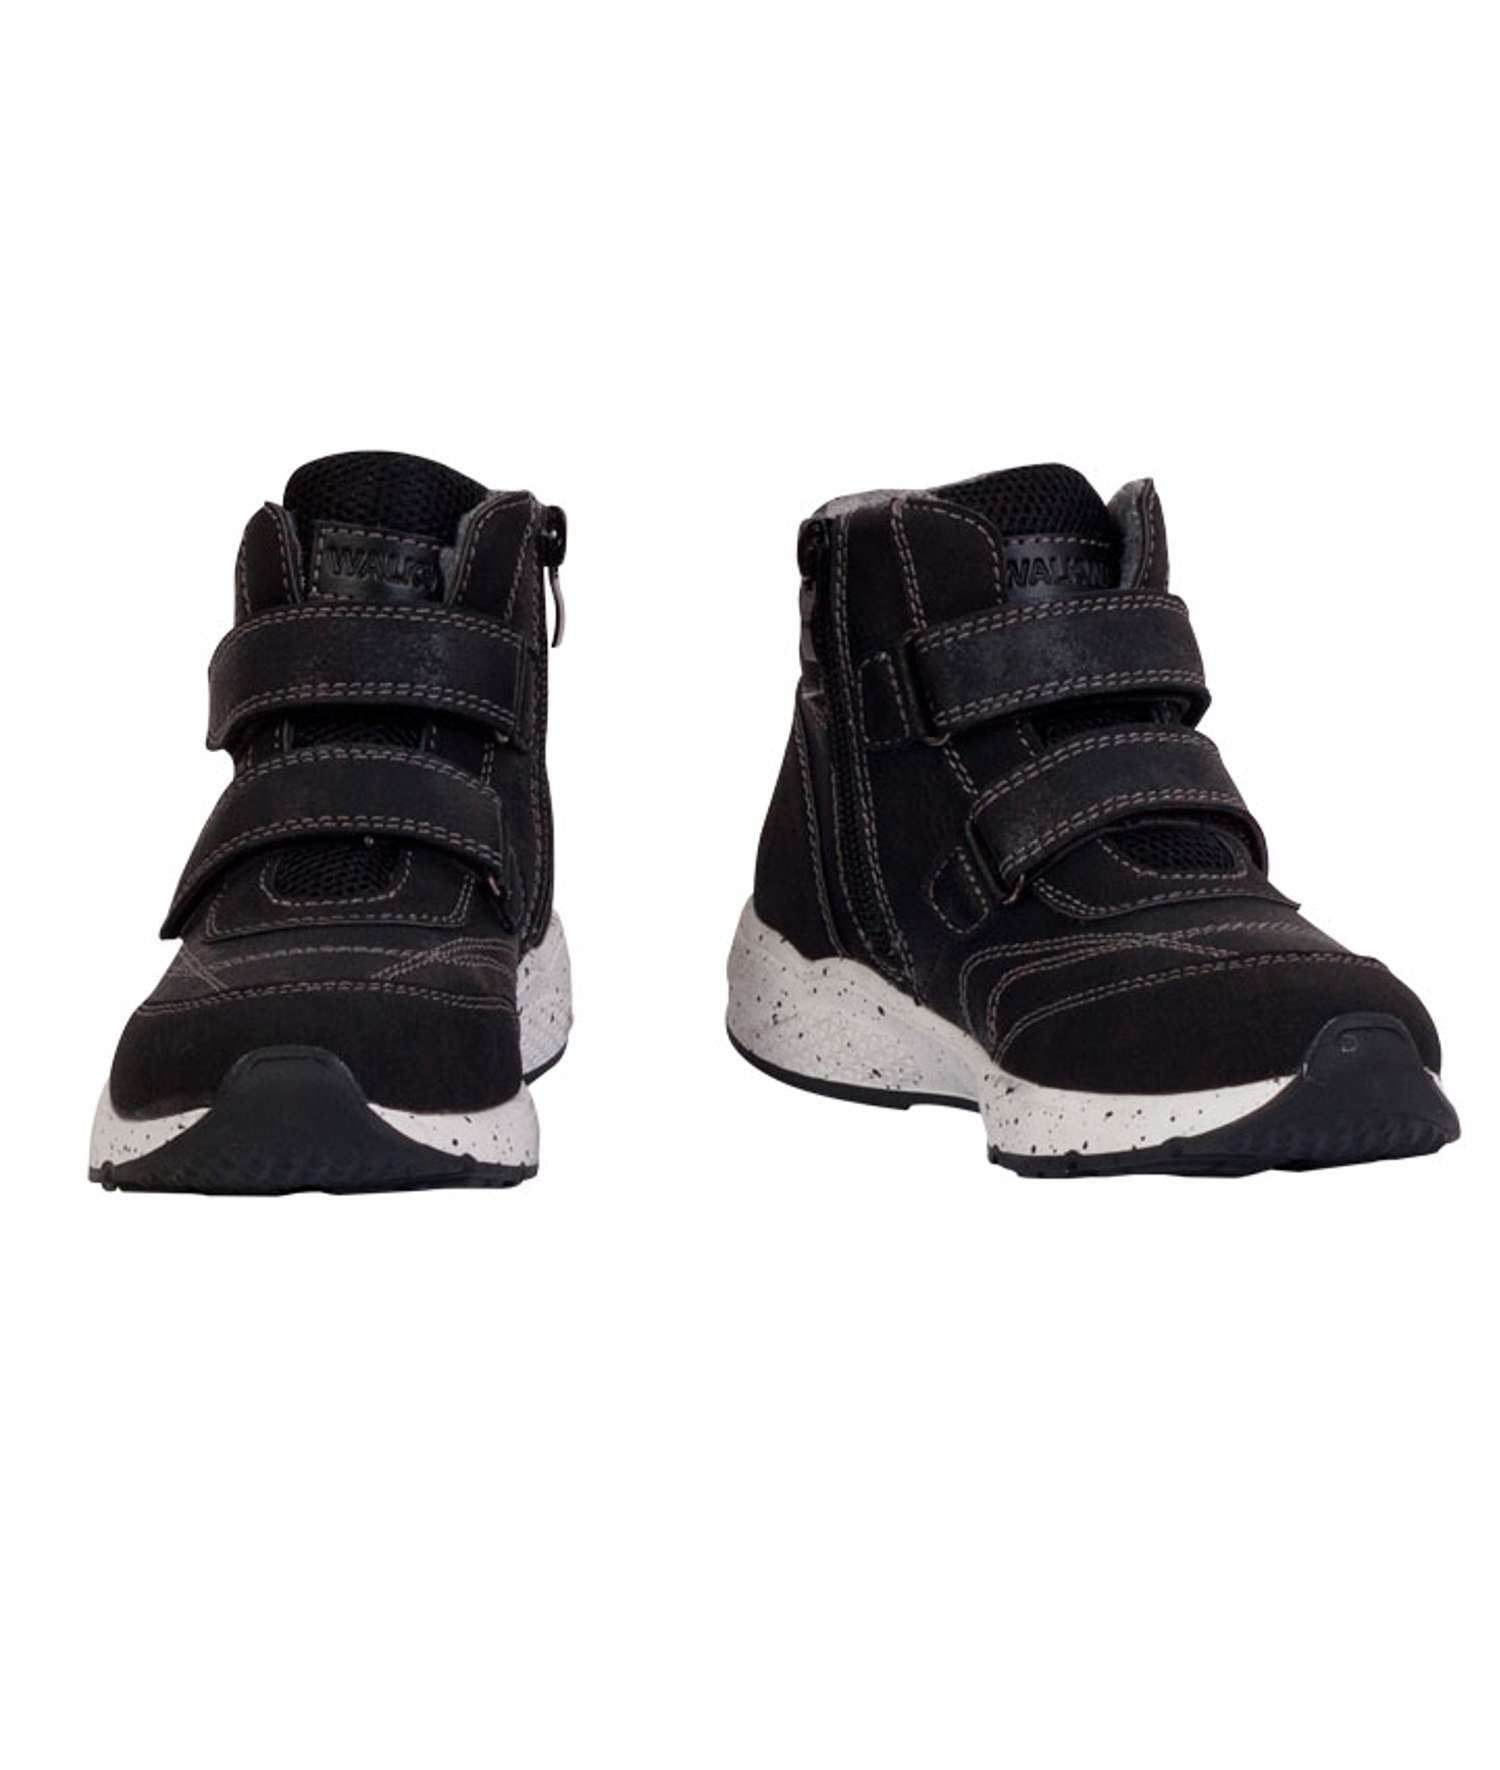 Walkway - Akako børne vinter sneakers - Sort - Størrelse 37